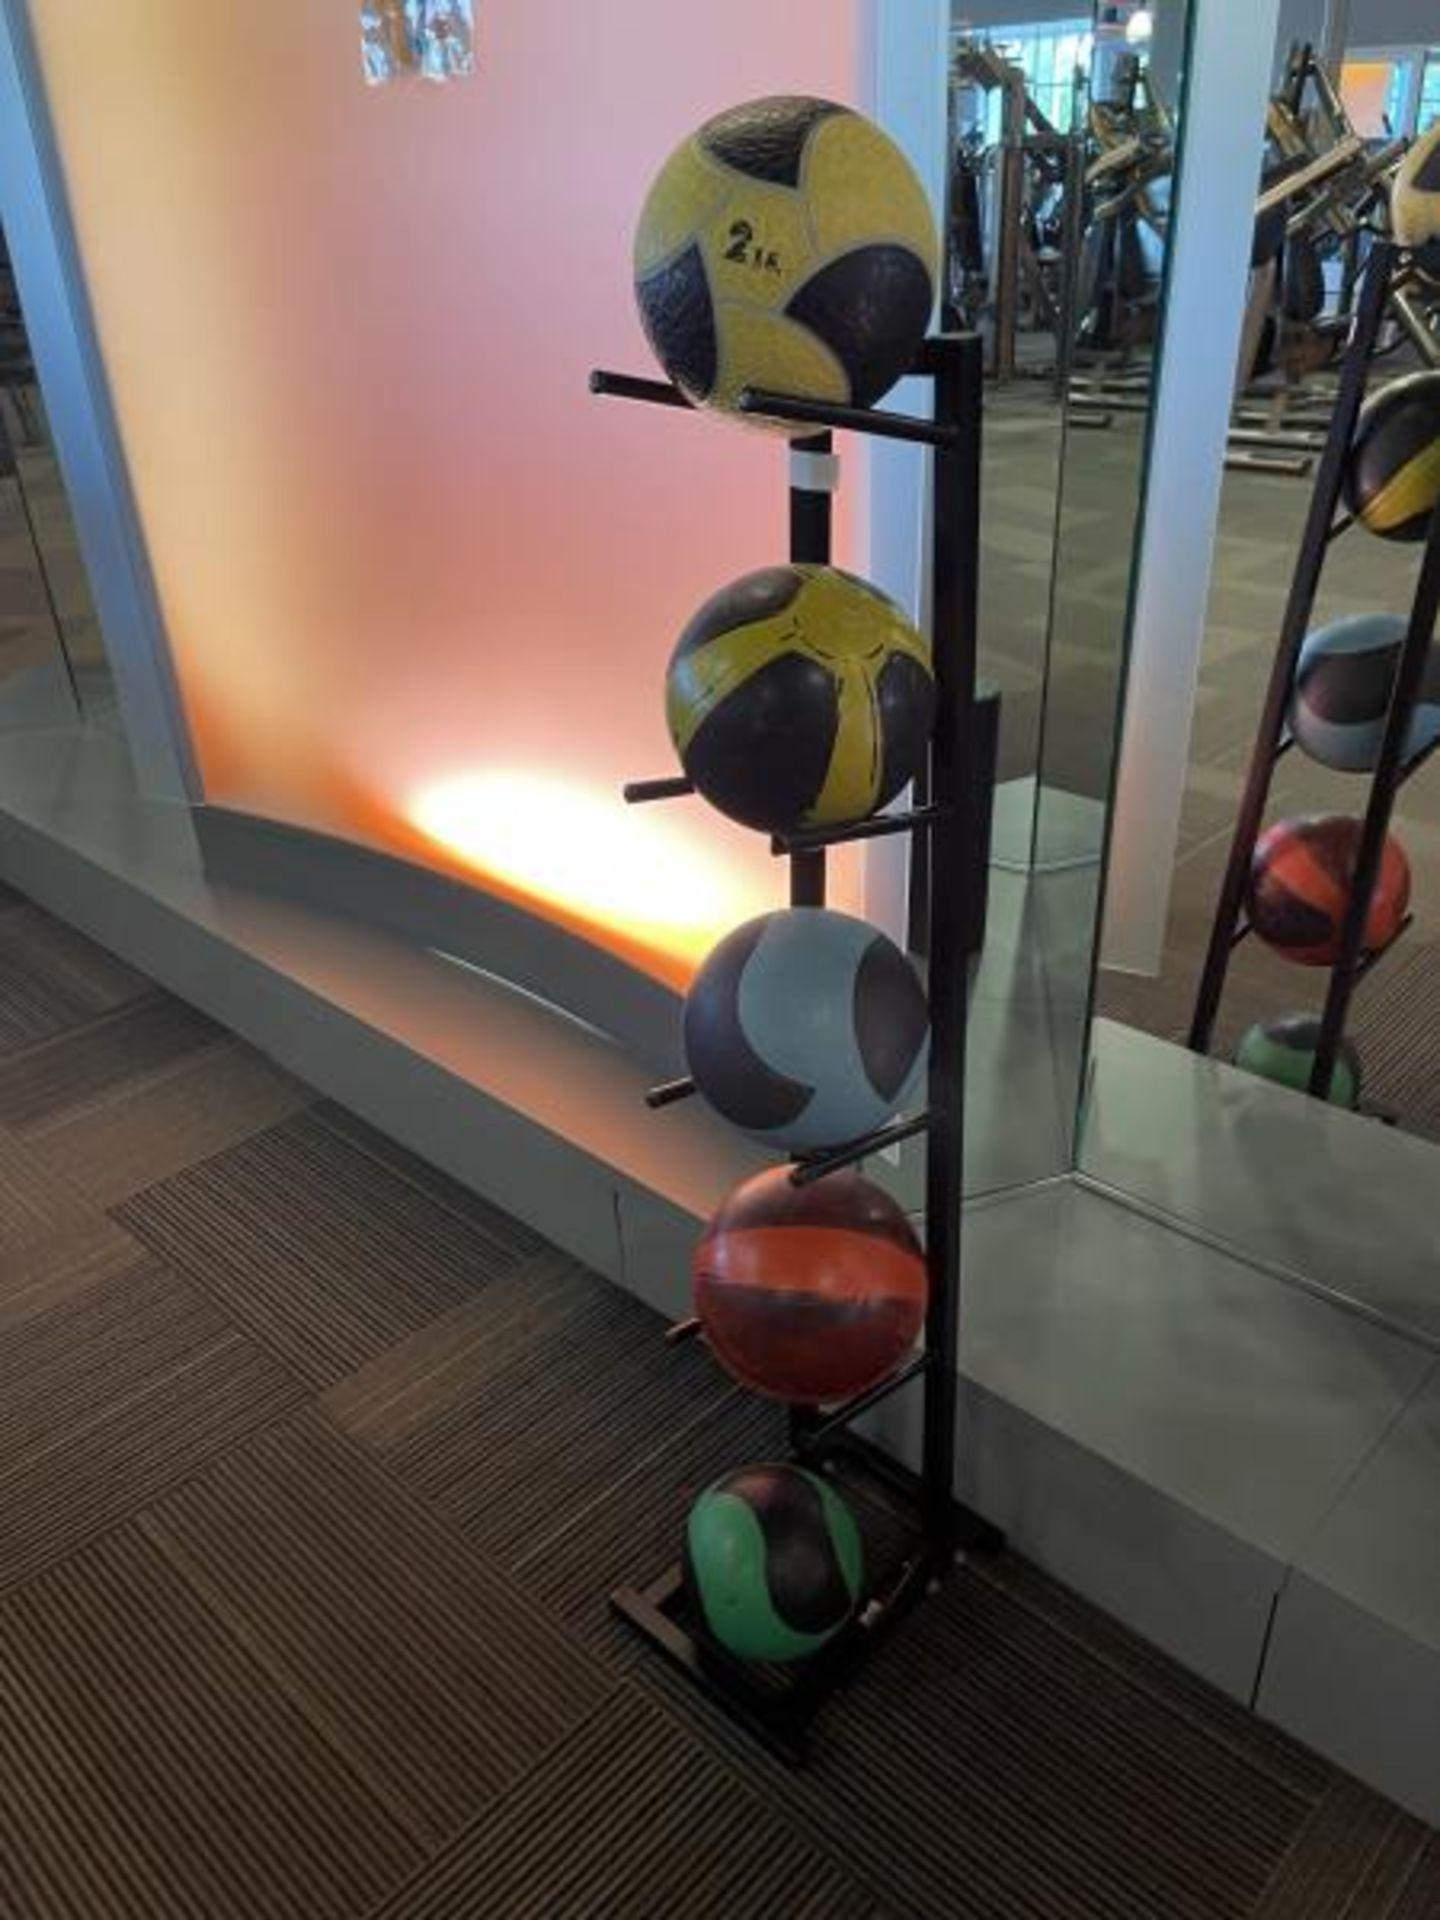 Medicine Training Balls with 5 Tier Metal Rack - Image 2 of 2